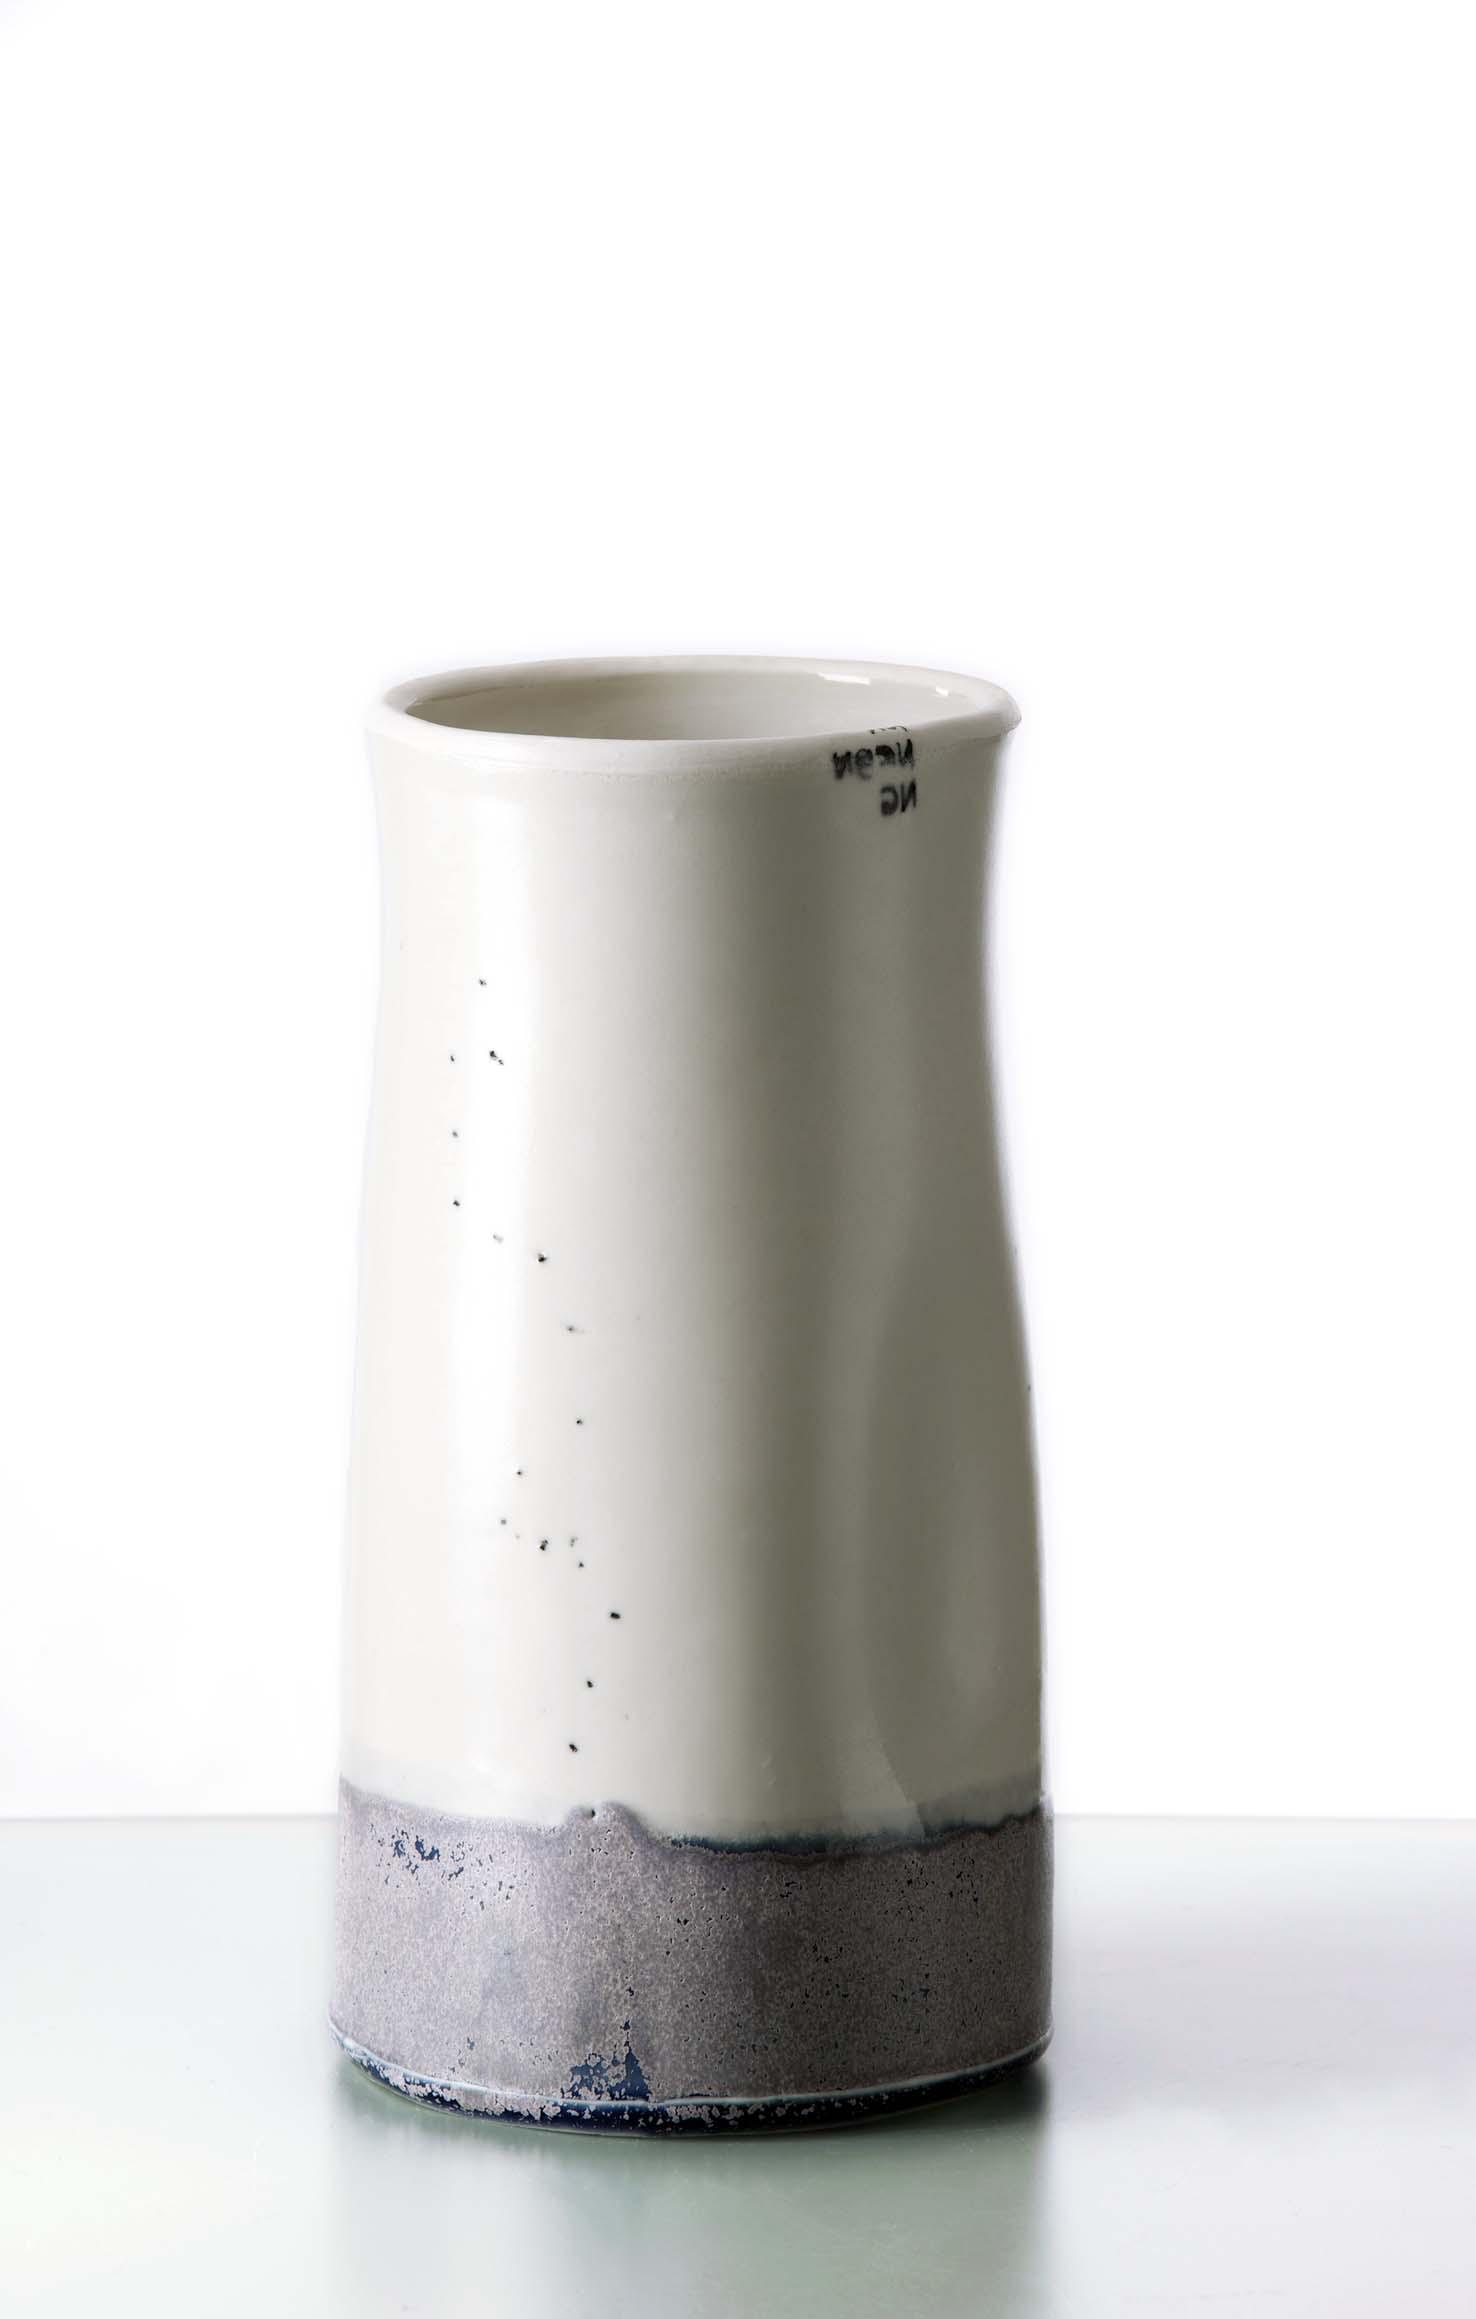 Ninna G Keramik_Limfjorden 1_6472lowres.jpg